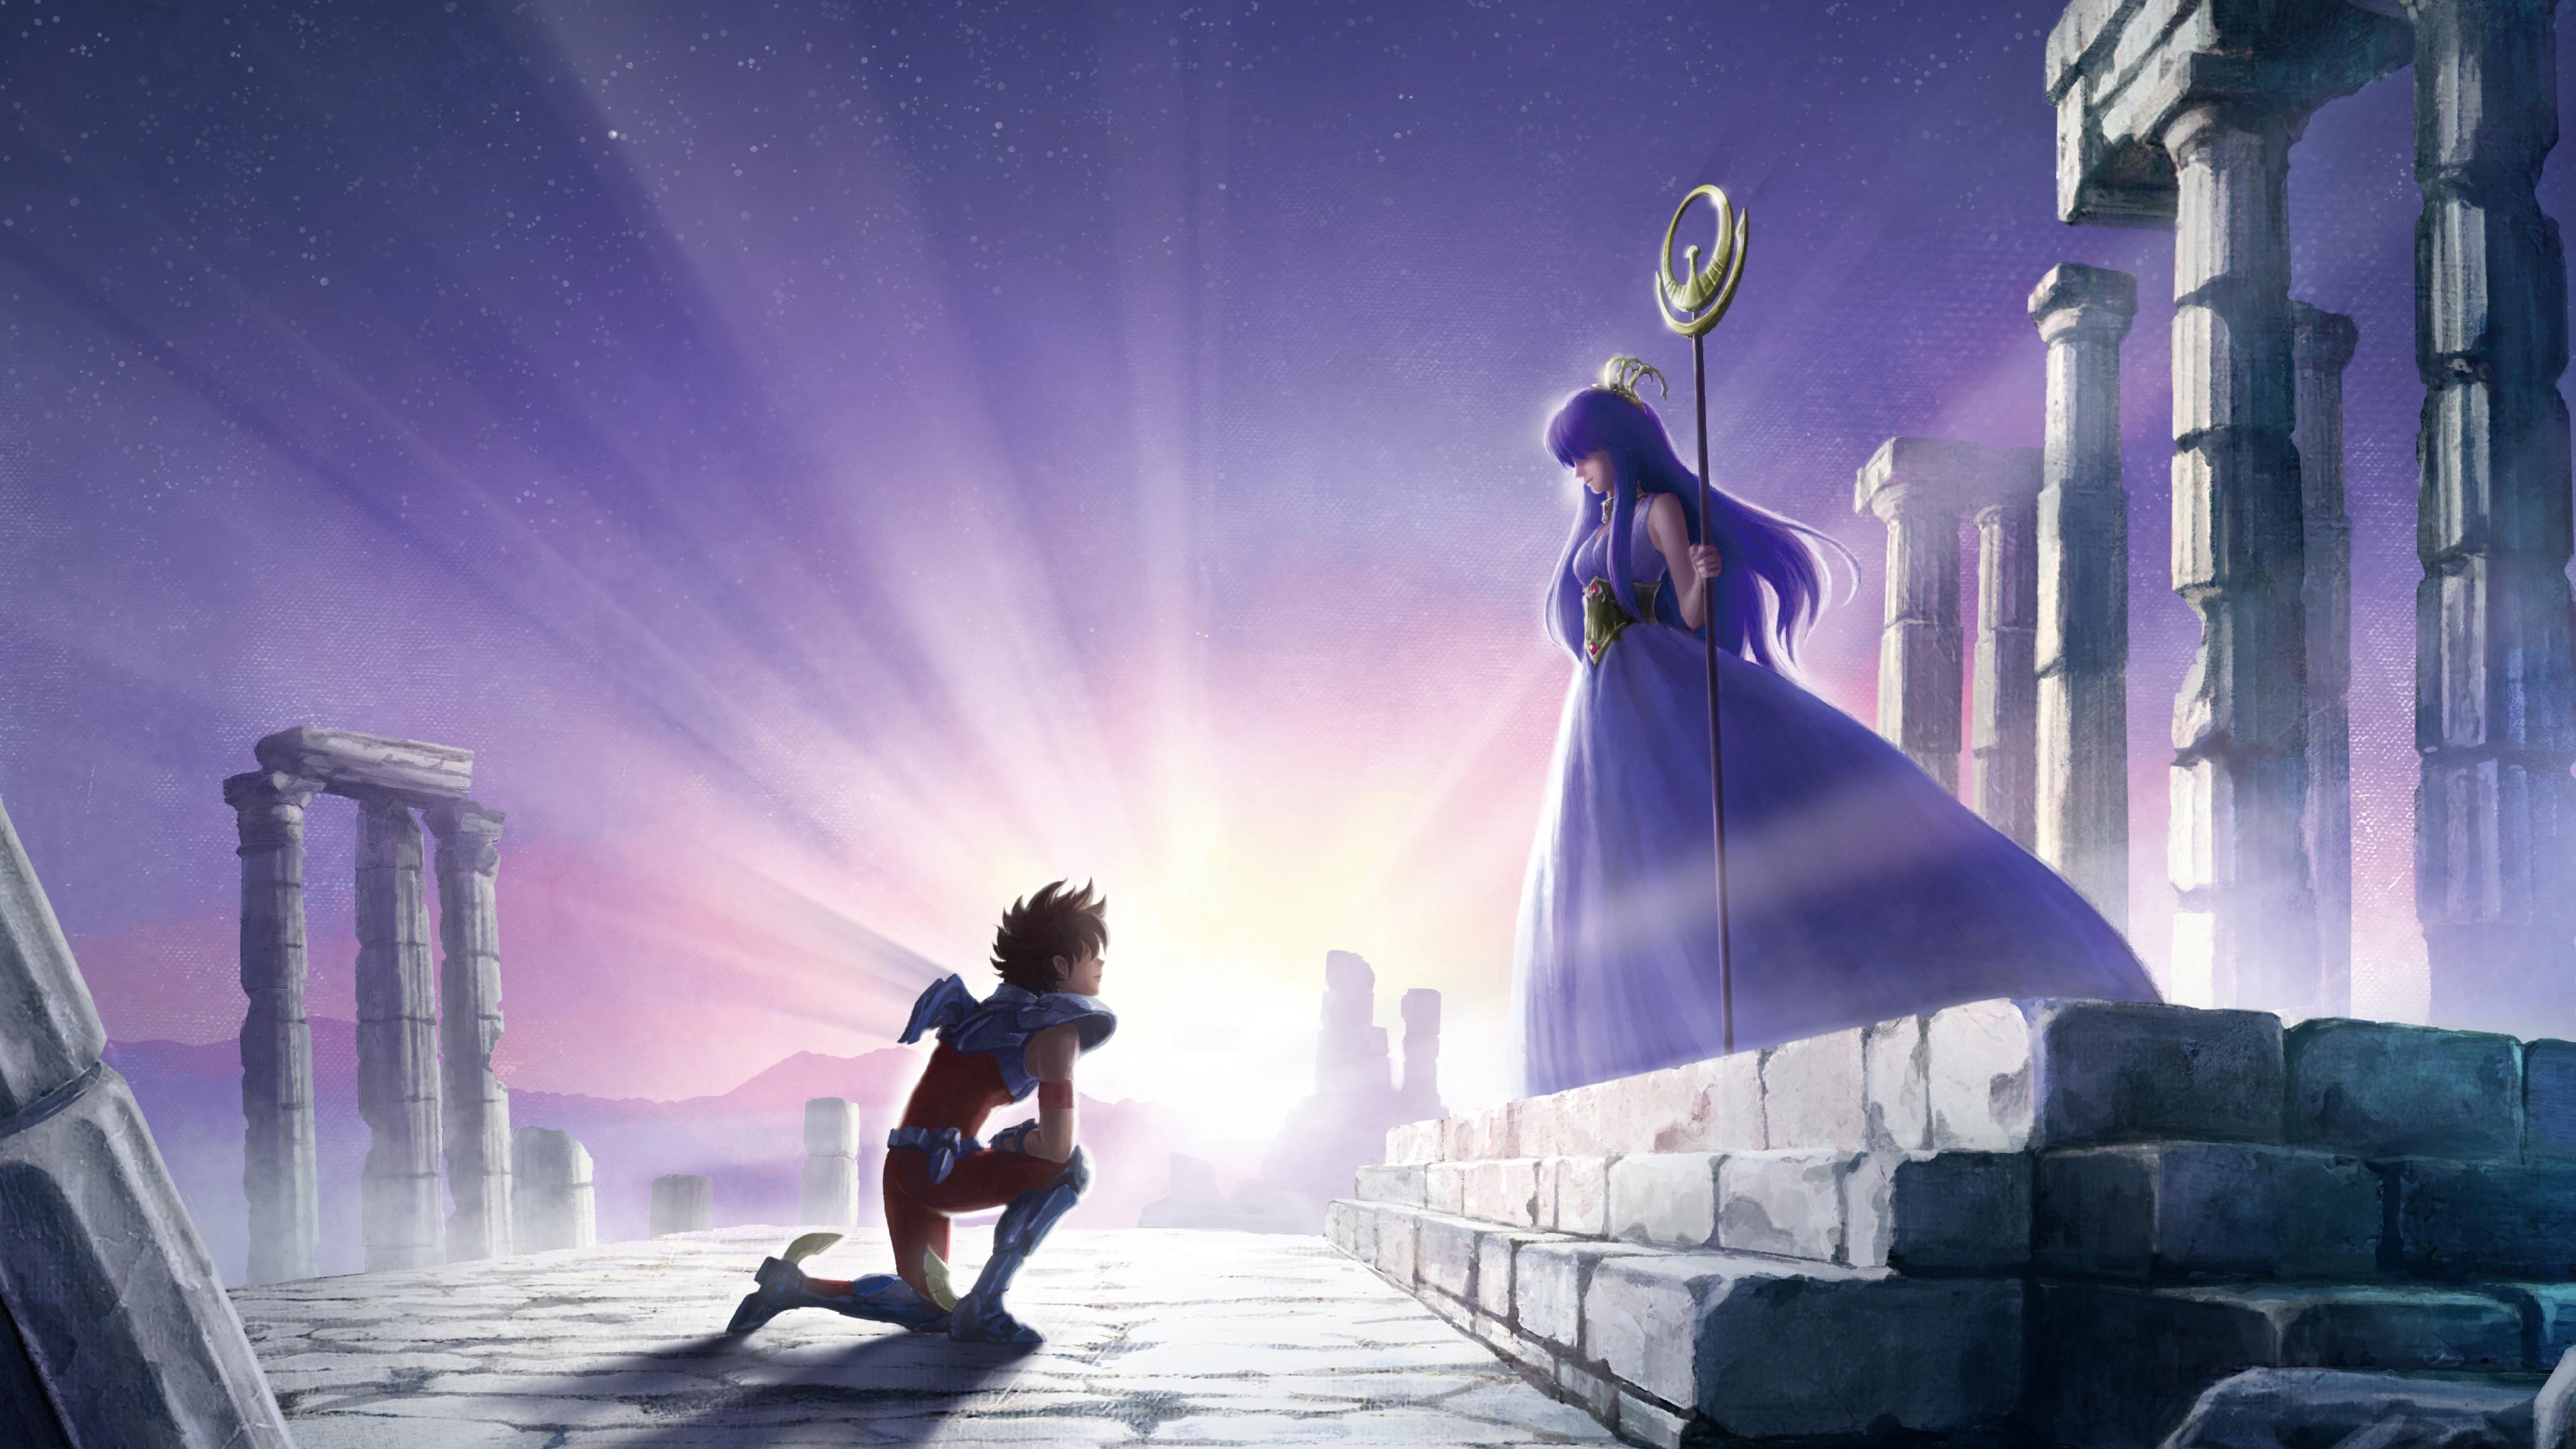 saint seiya knights of the zodiac ps4wallpapers com